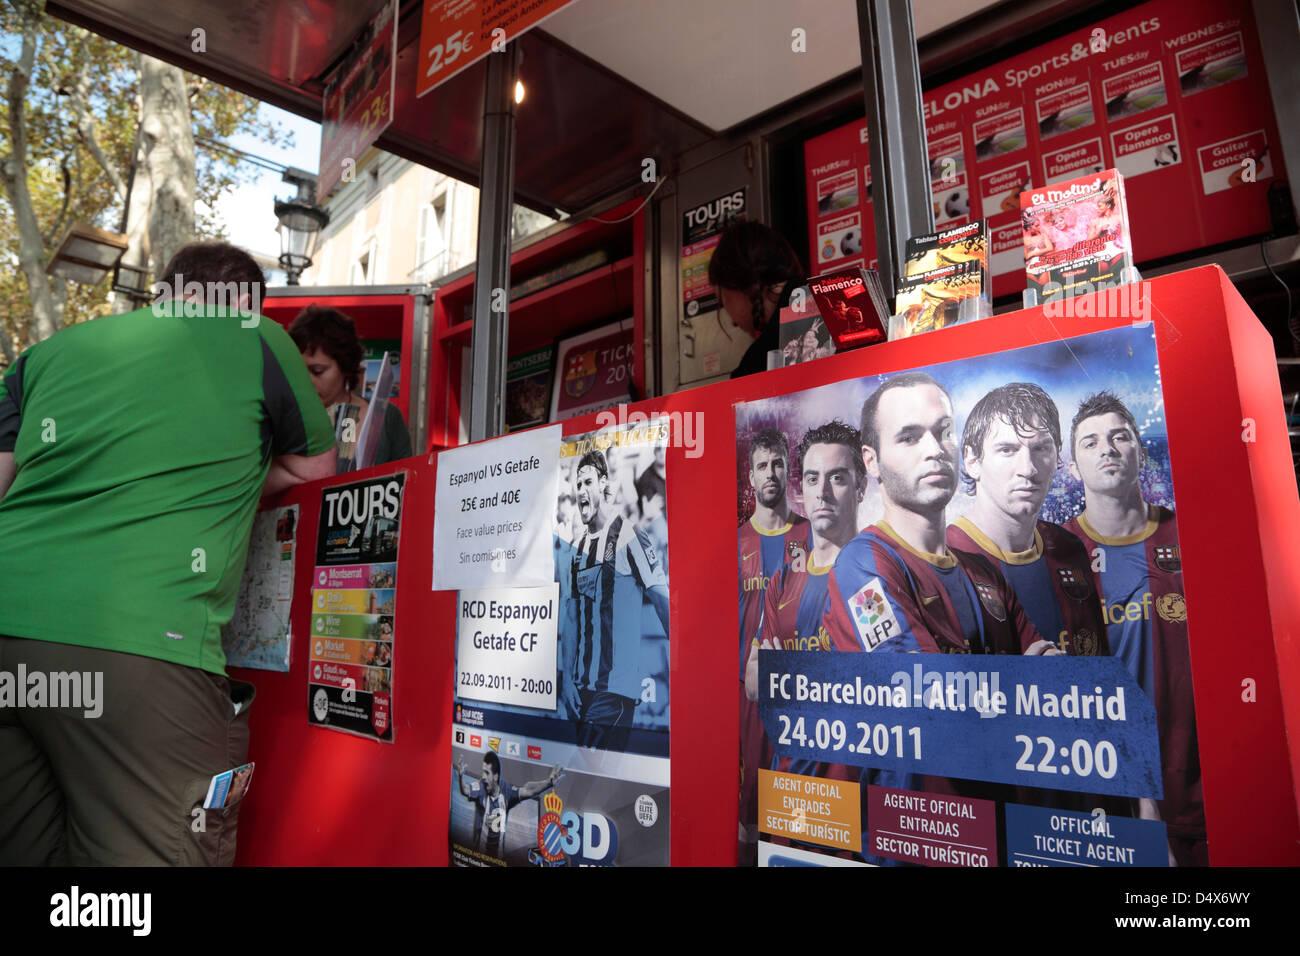 Selling Football-Tickets at Ramblas, Barcelona, Spain - Stock Image